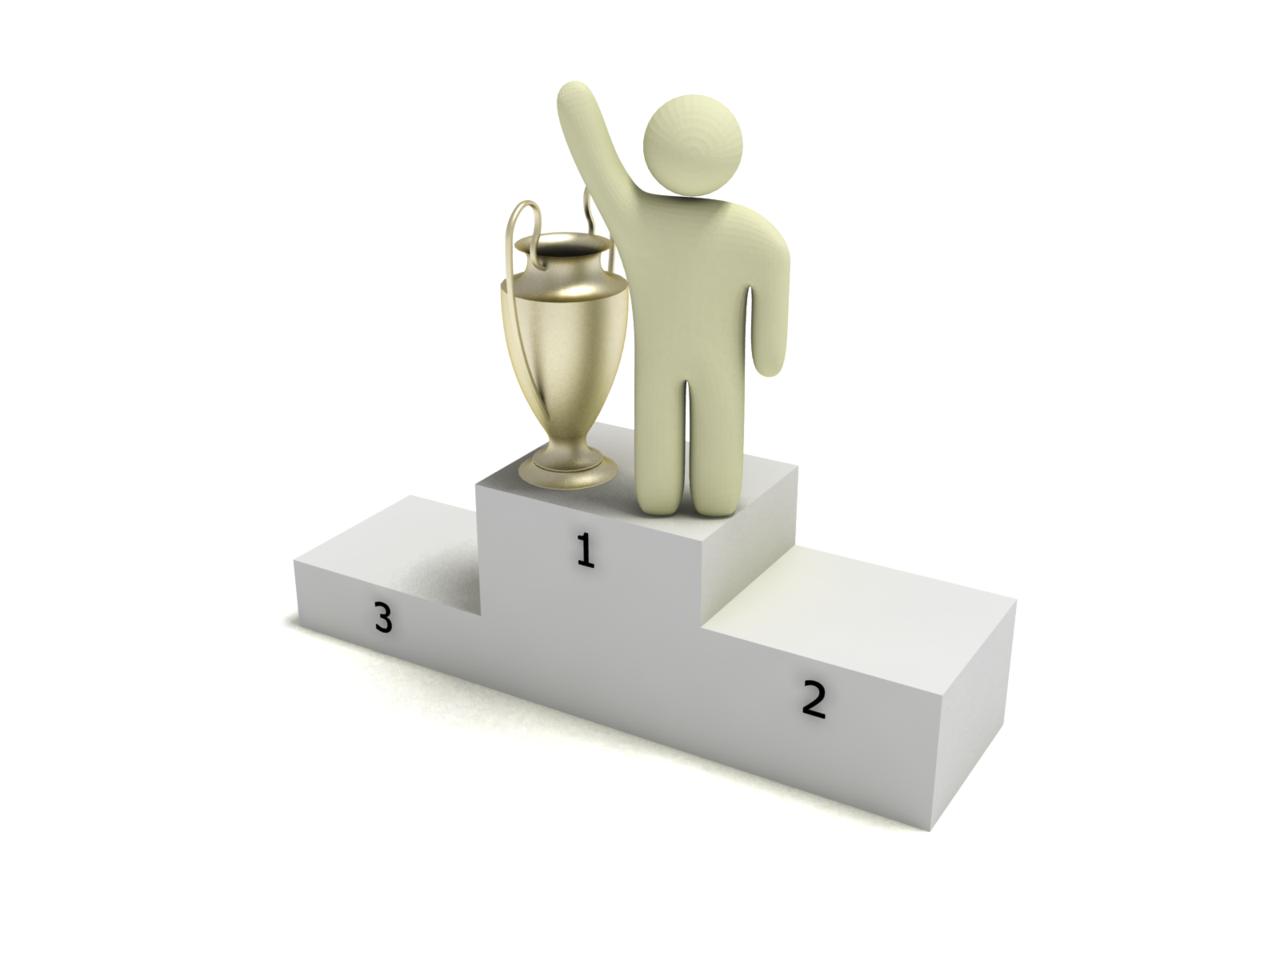 Verkiezing 'Ondernemer van het jaar 2012'